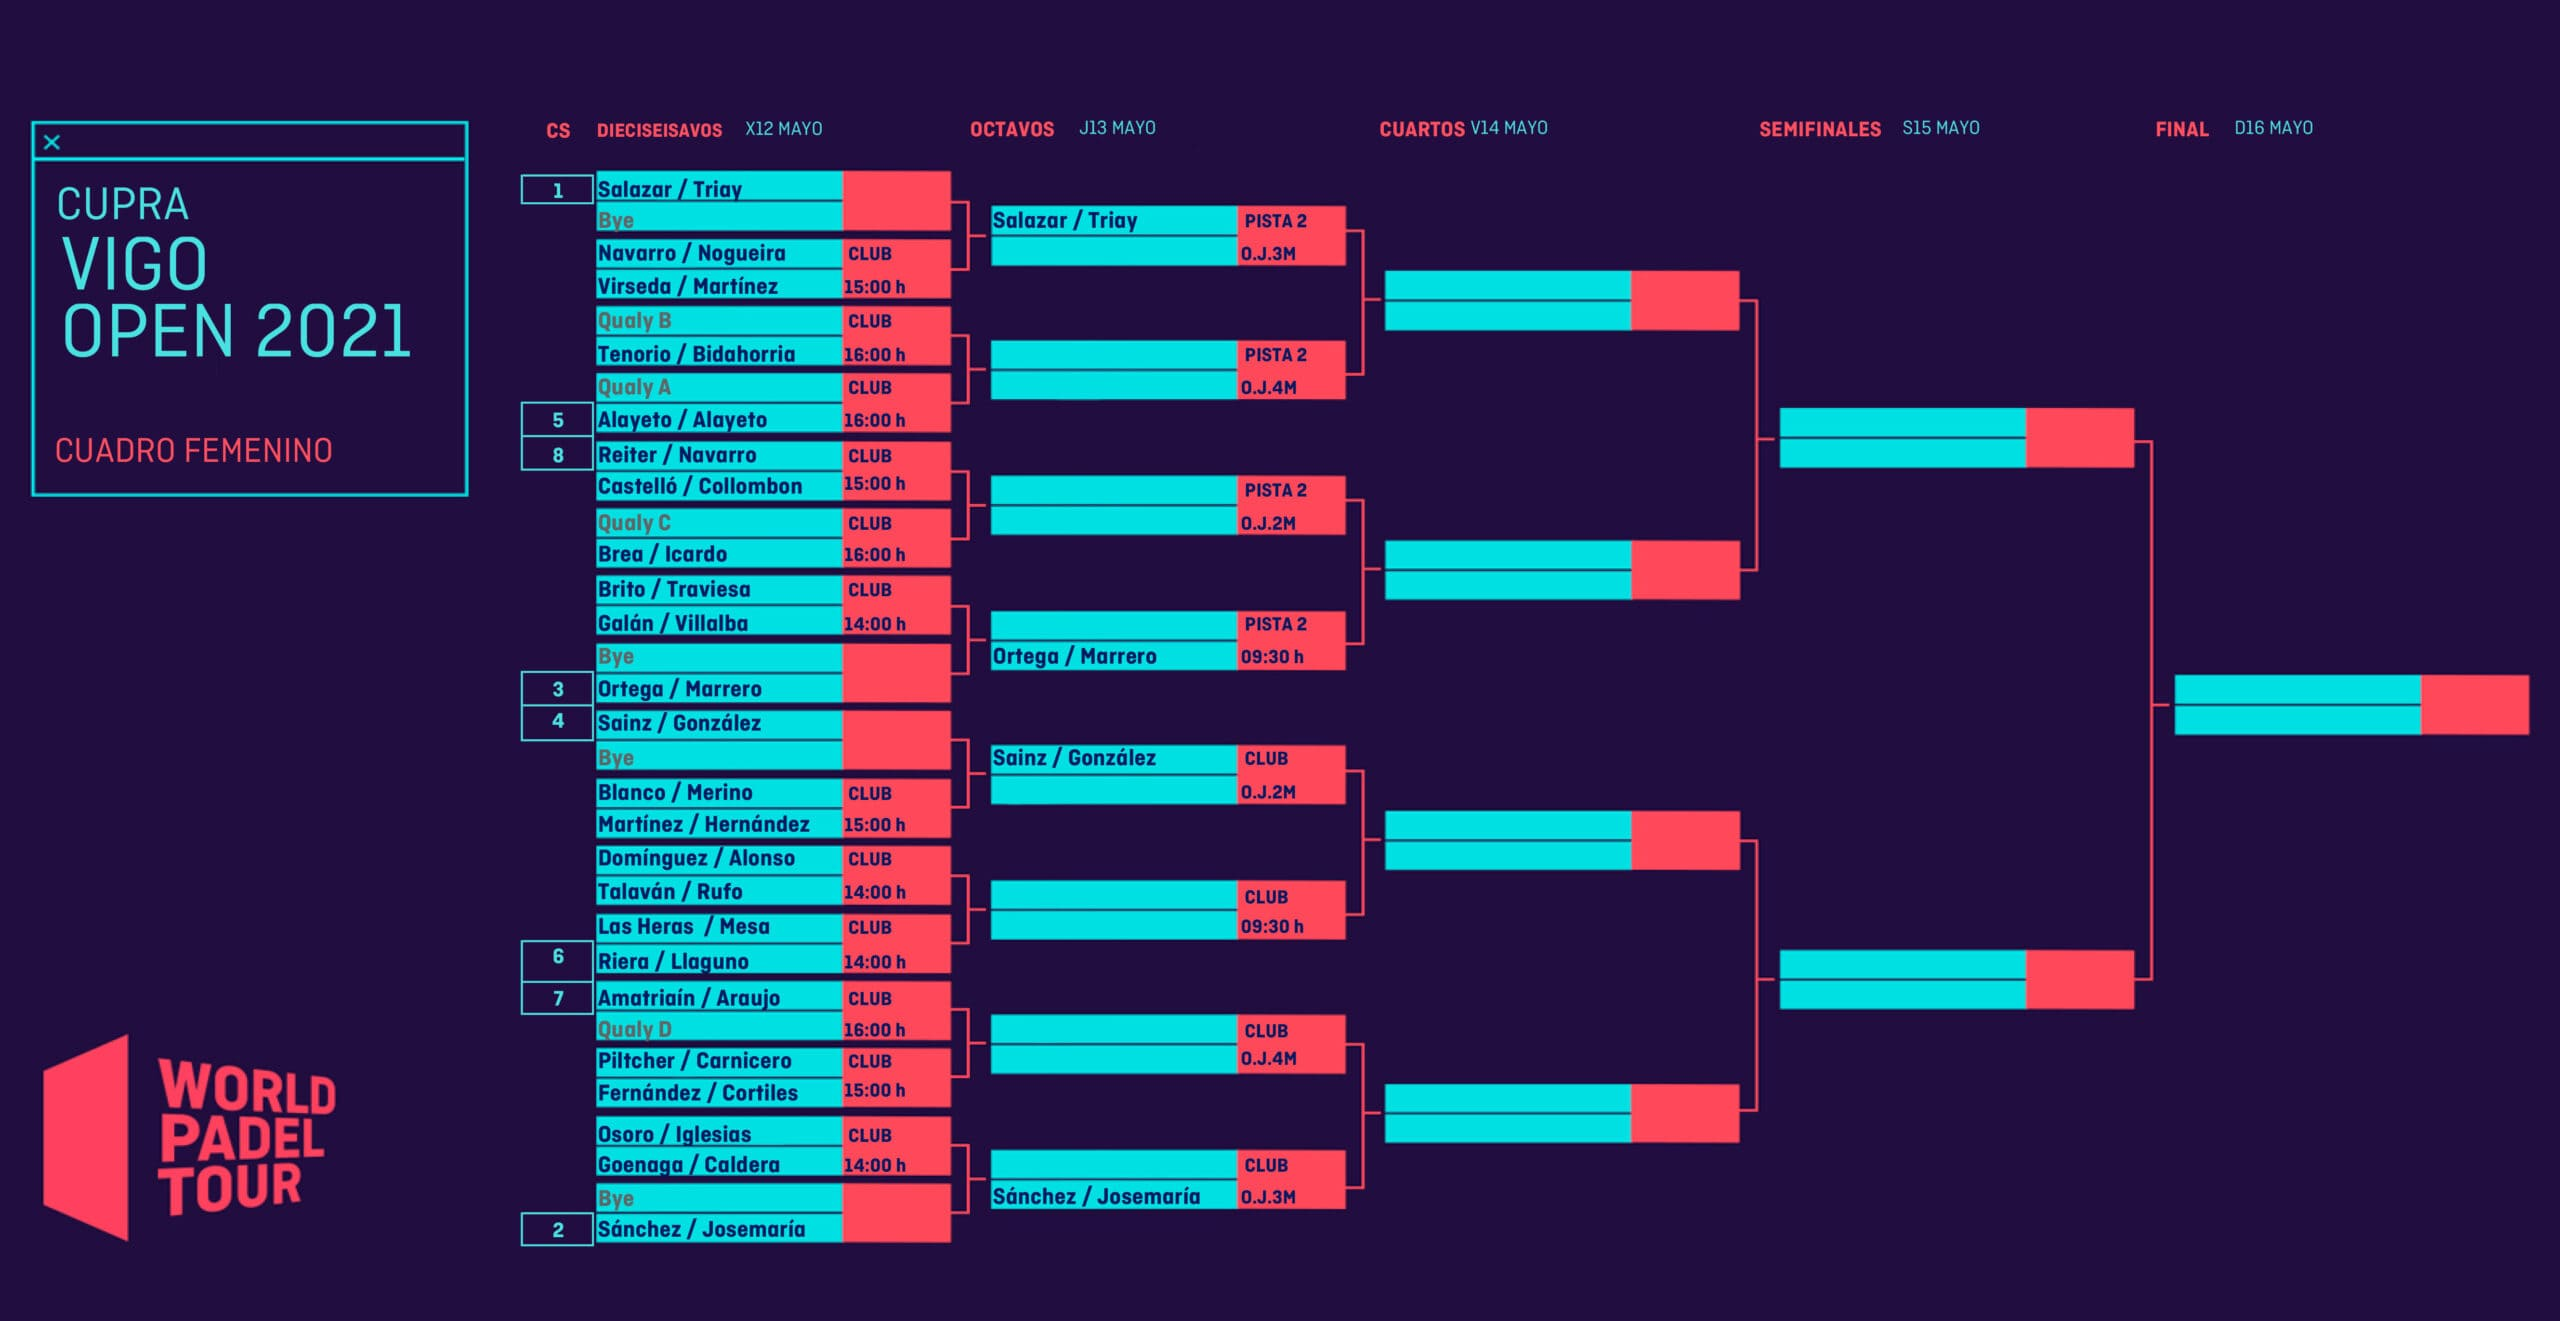 Cuadro final femenino del Cupra Vigo Open